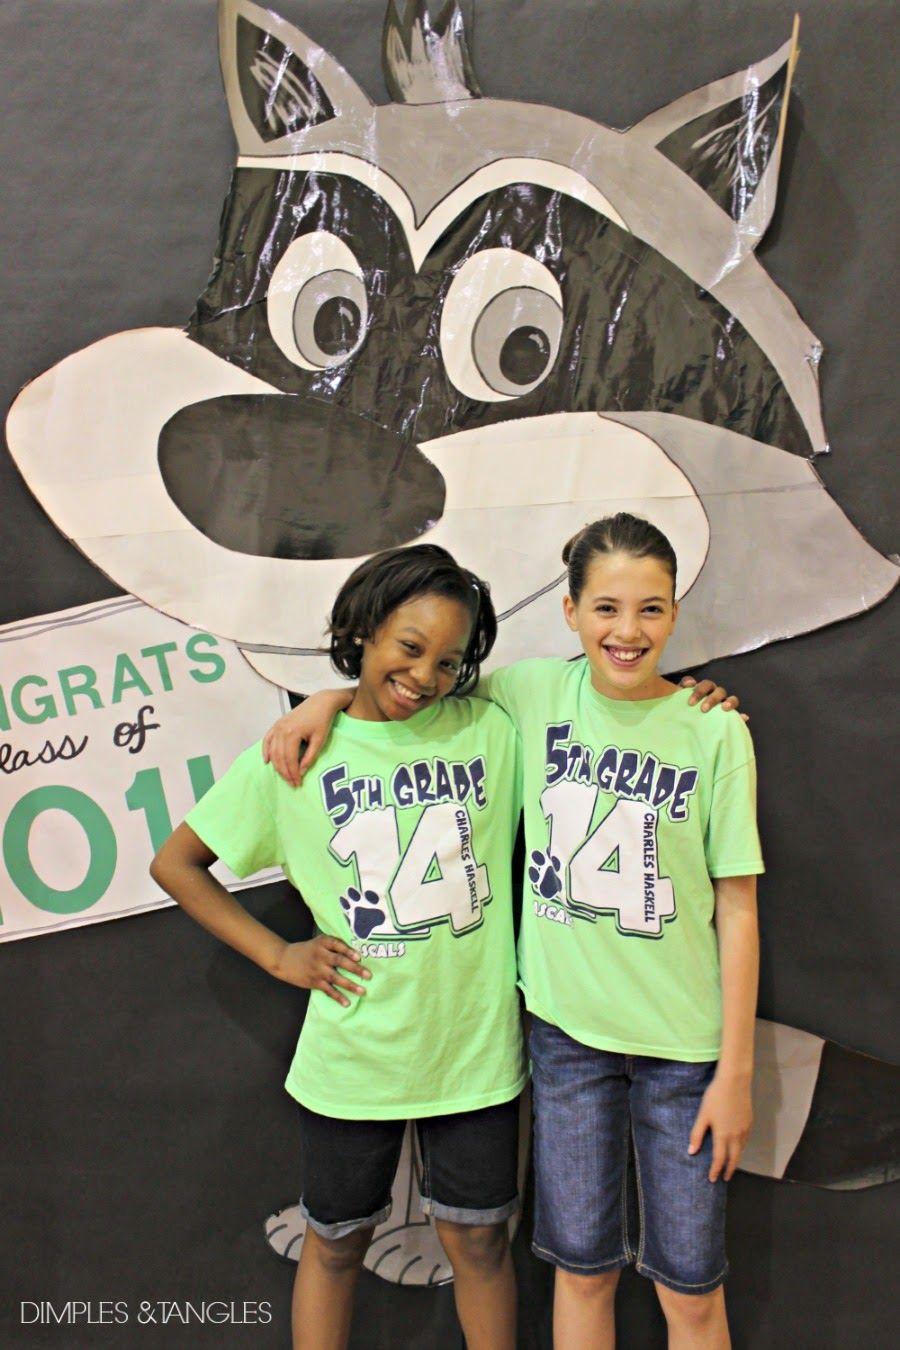 5Th Grade Girl Graduation Gift Ideas  5TH GRADE GRADUATION SCHOOL GYM DECORATIONS AND TEACHER